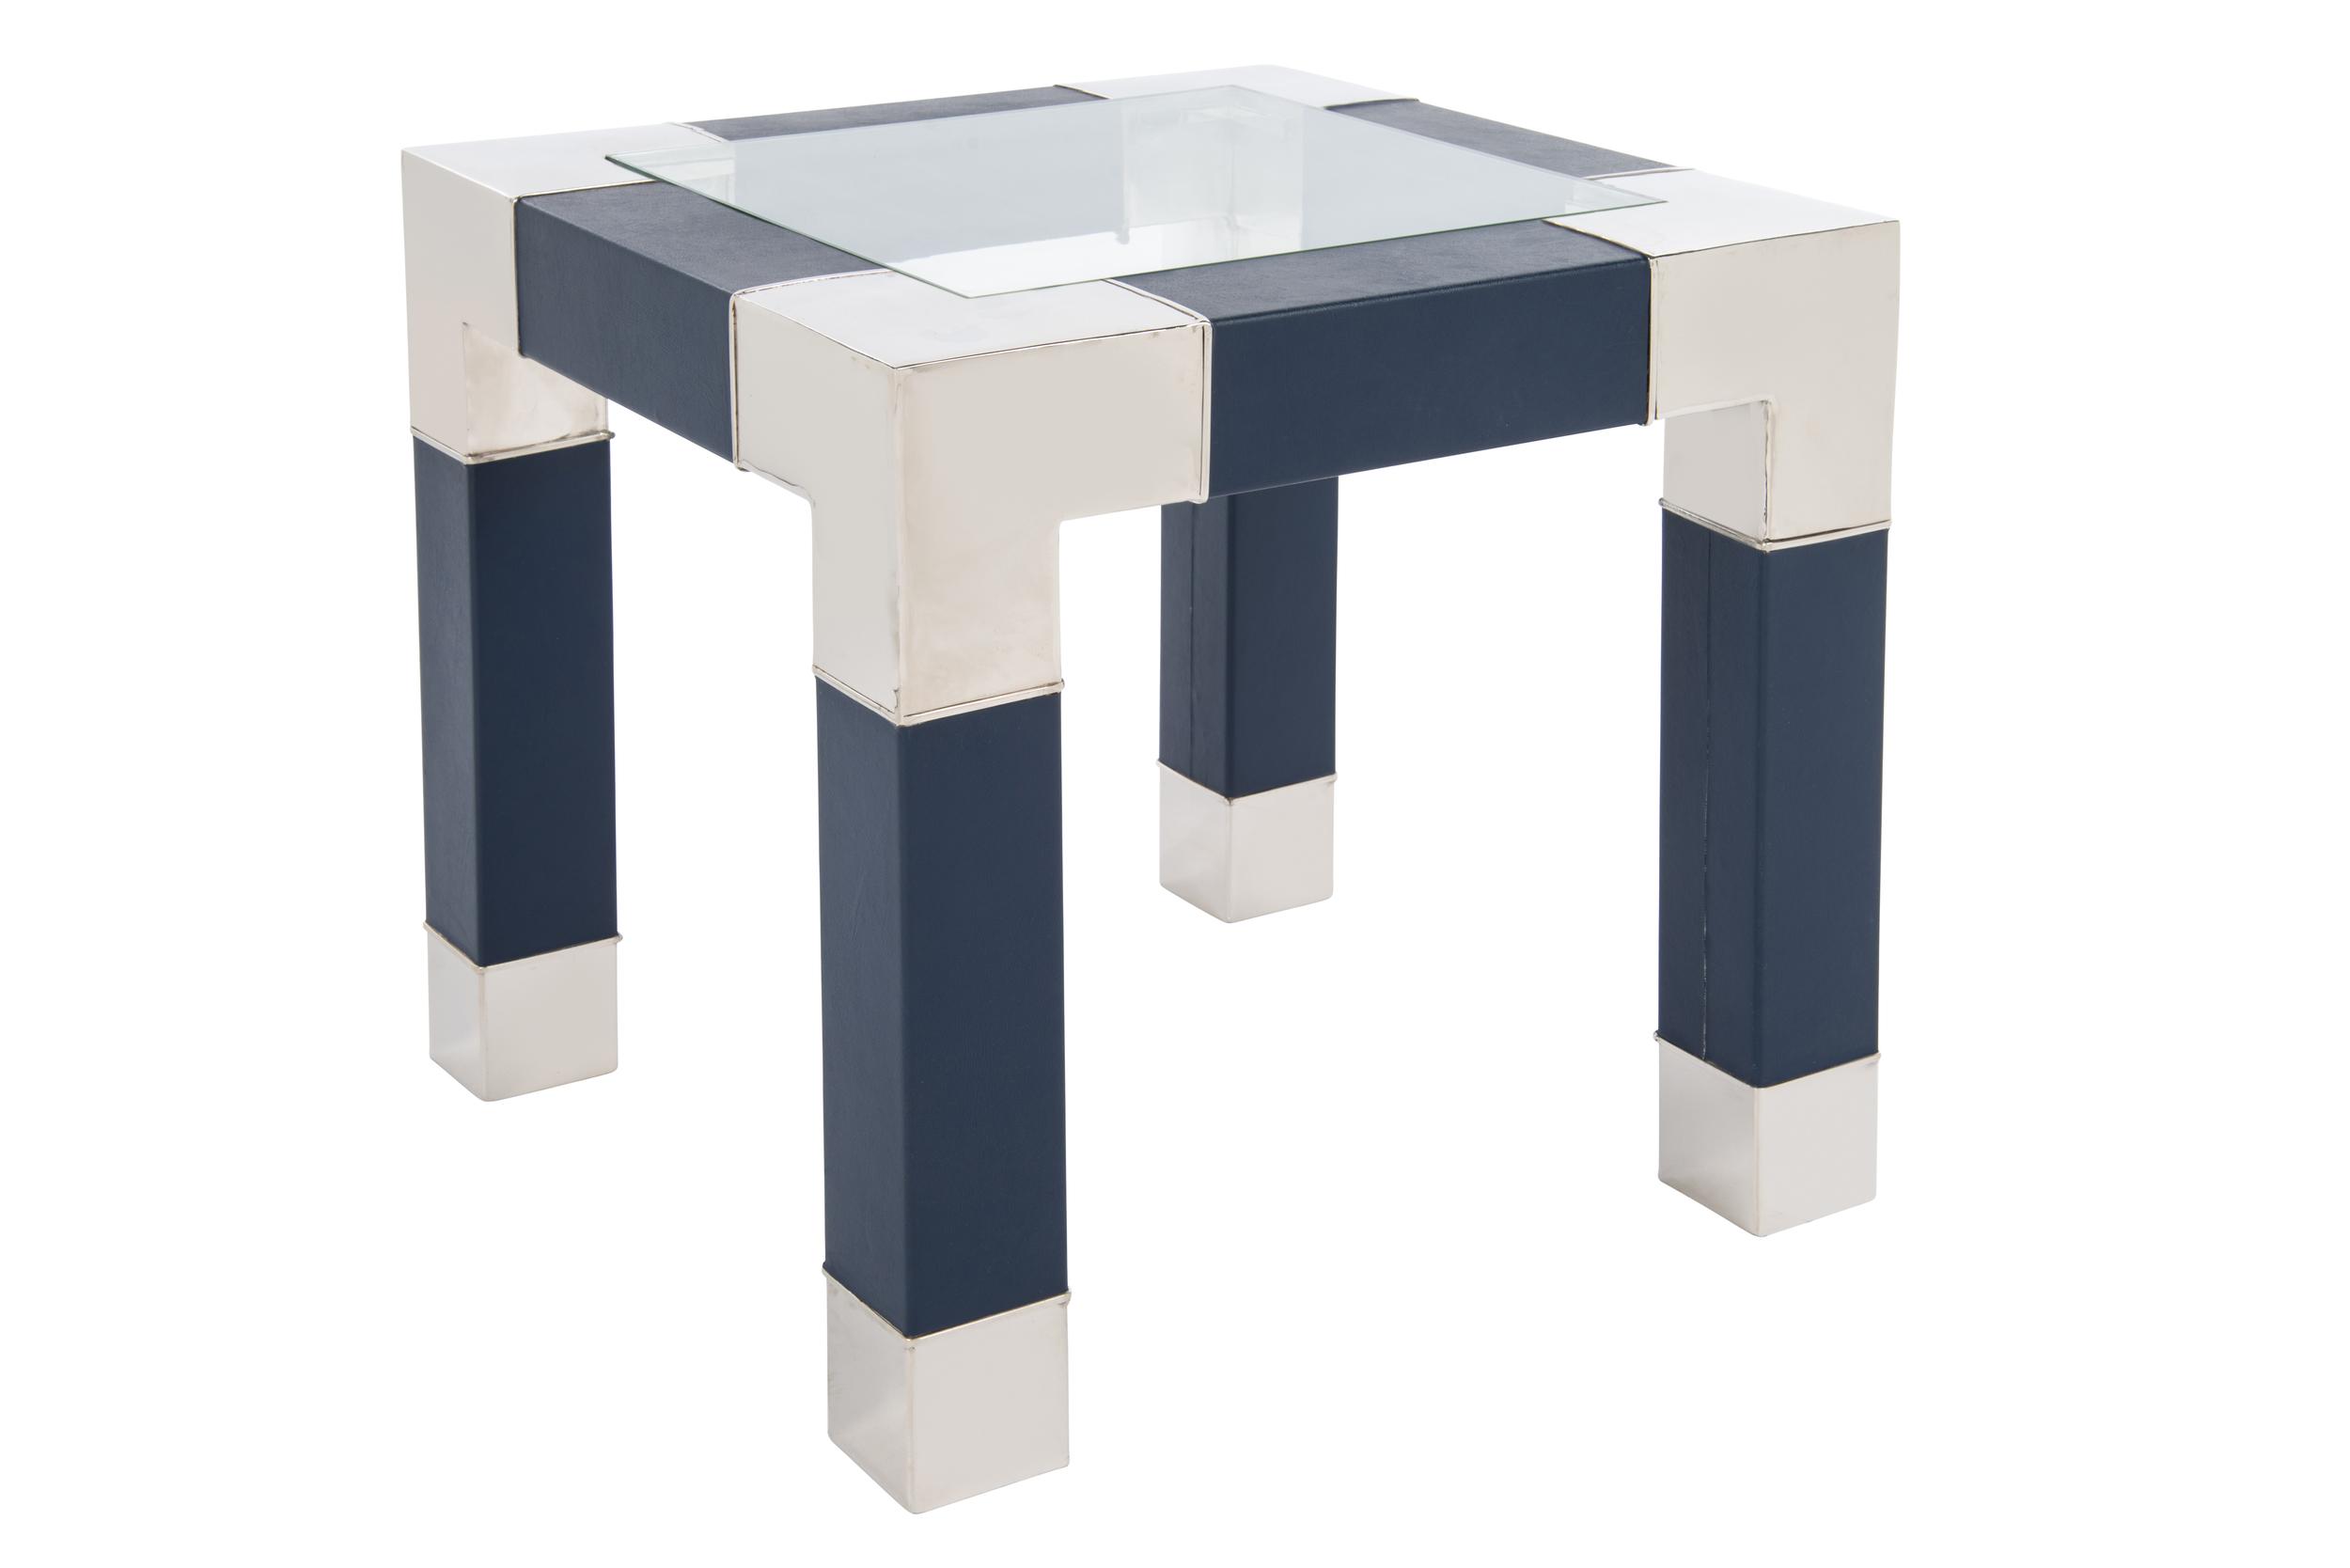 Desmond Table